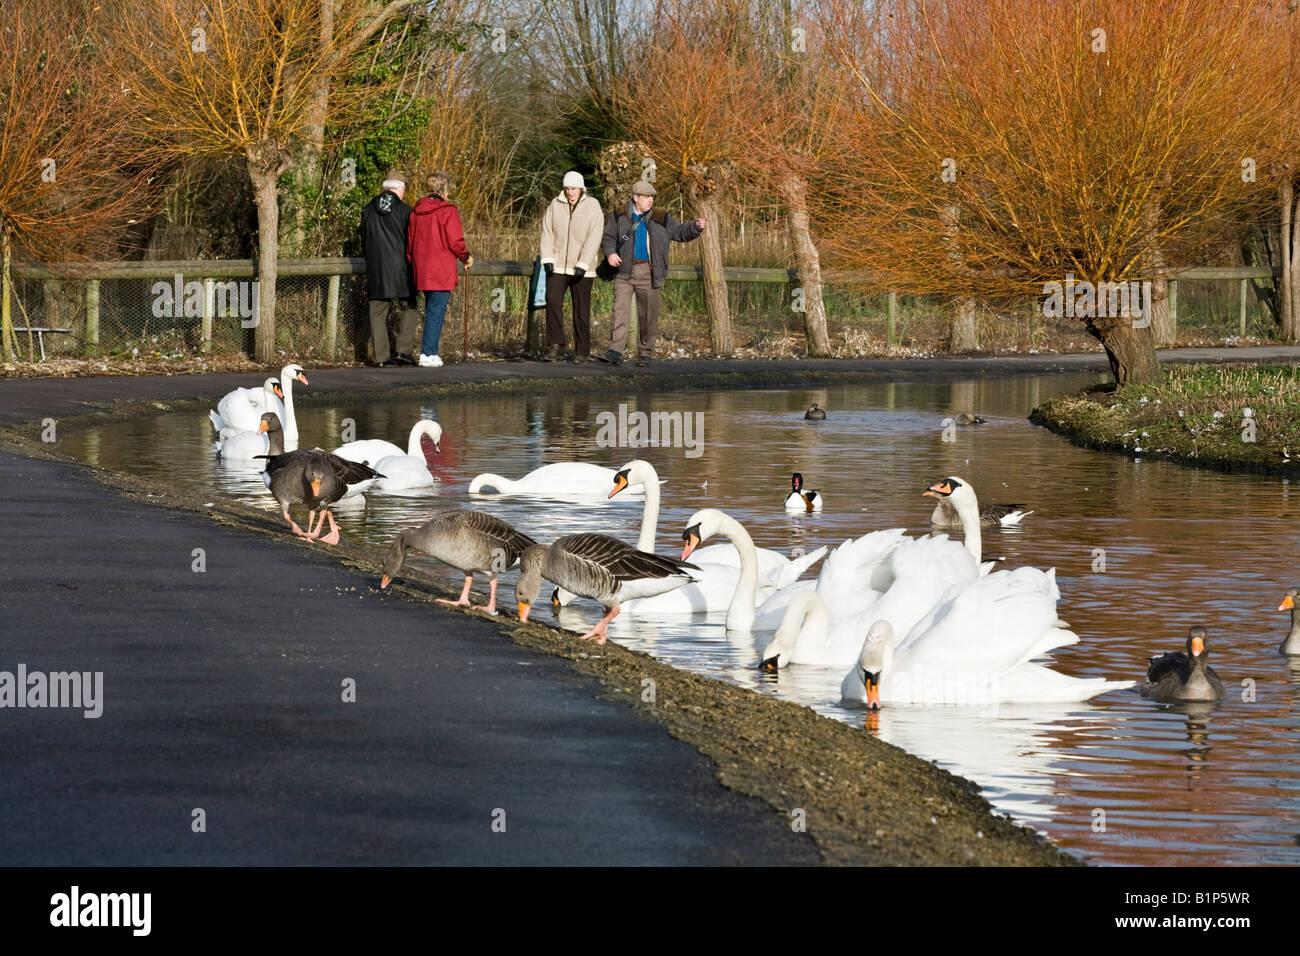 Visitors enjoying the winter sunshine at the Wildfowl & Wetlands Trust Slimbridge Wetland Centre, Gloucestershire - Stock Image